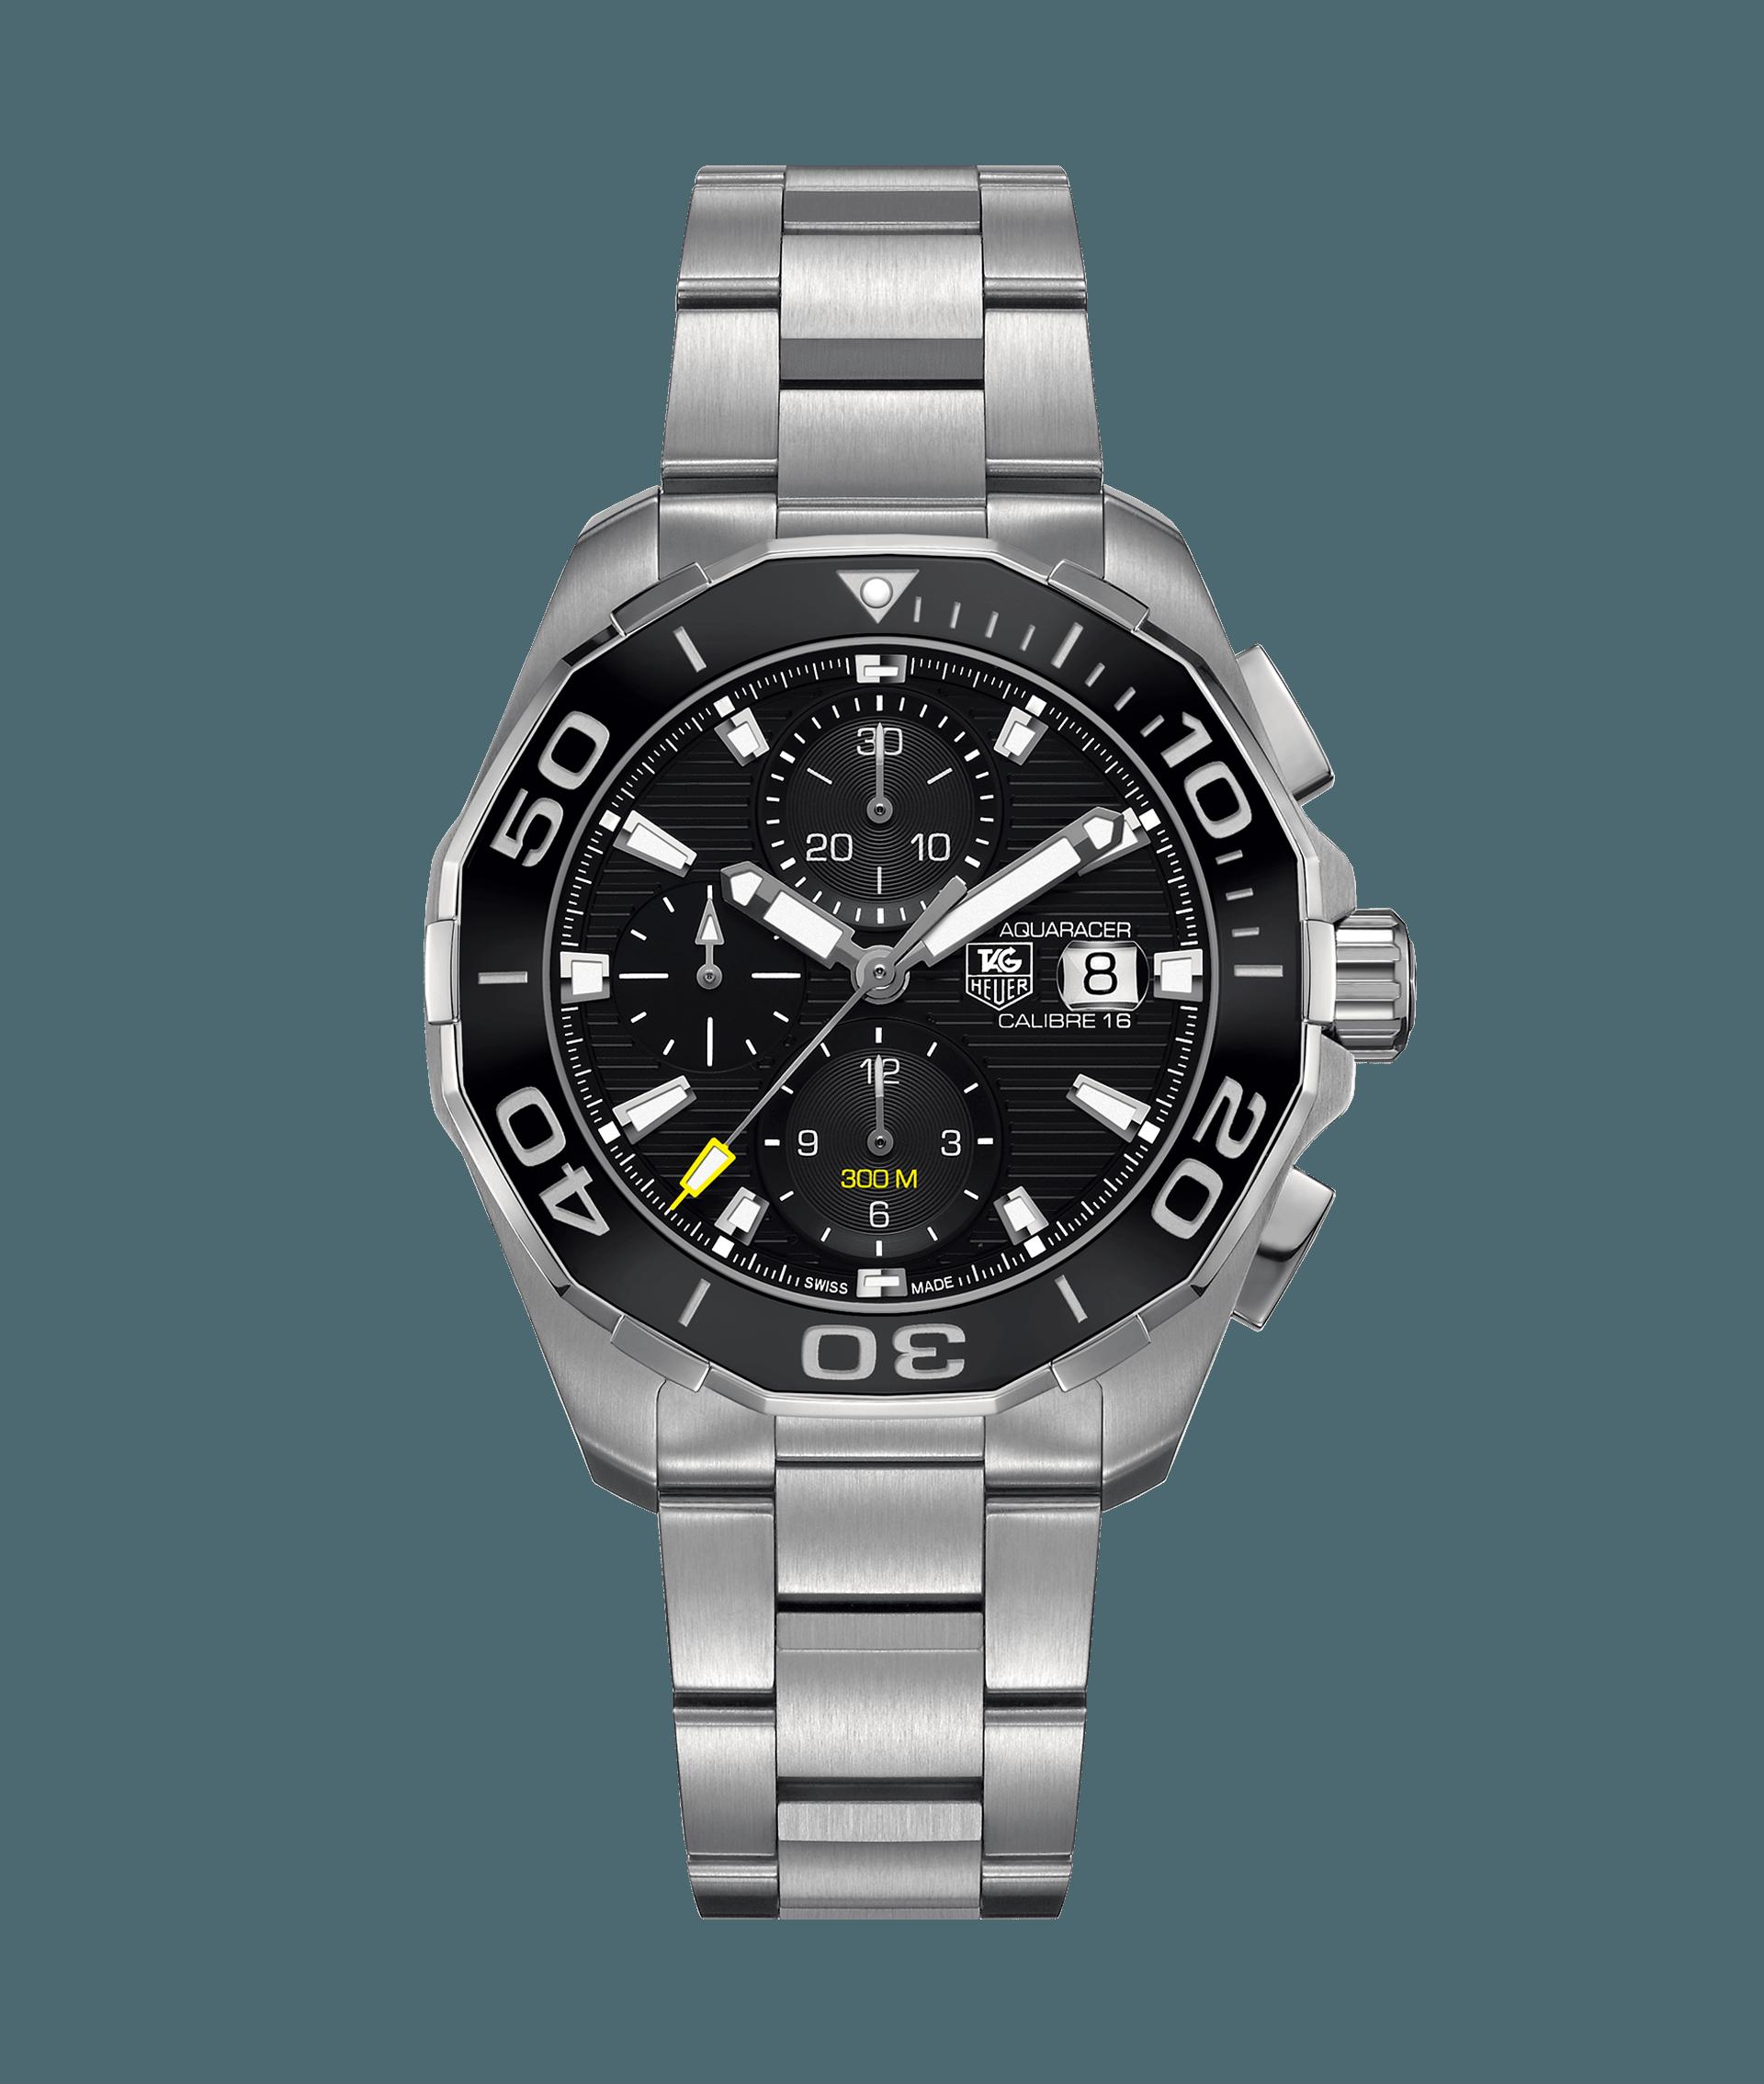 d35fe179e40 Aquaracer Calibre 16 Automatic Chronograph 300M - 43MM Ceramic Bezel  CAY211A.BA0927 TAG Heuer watch price